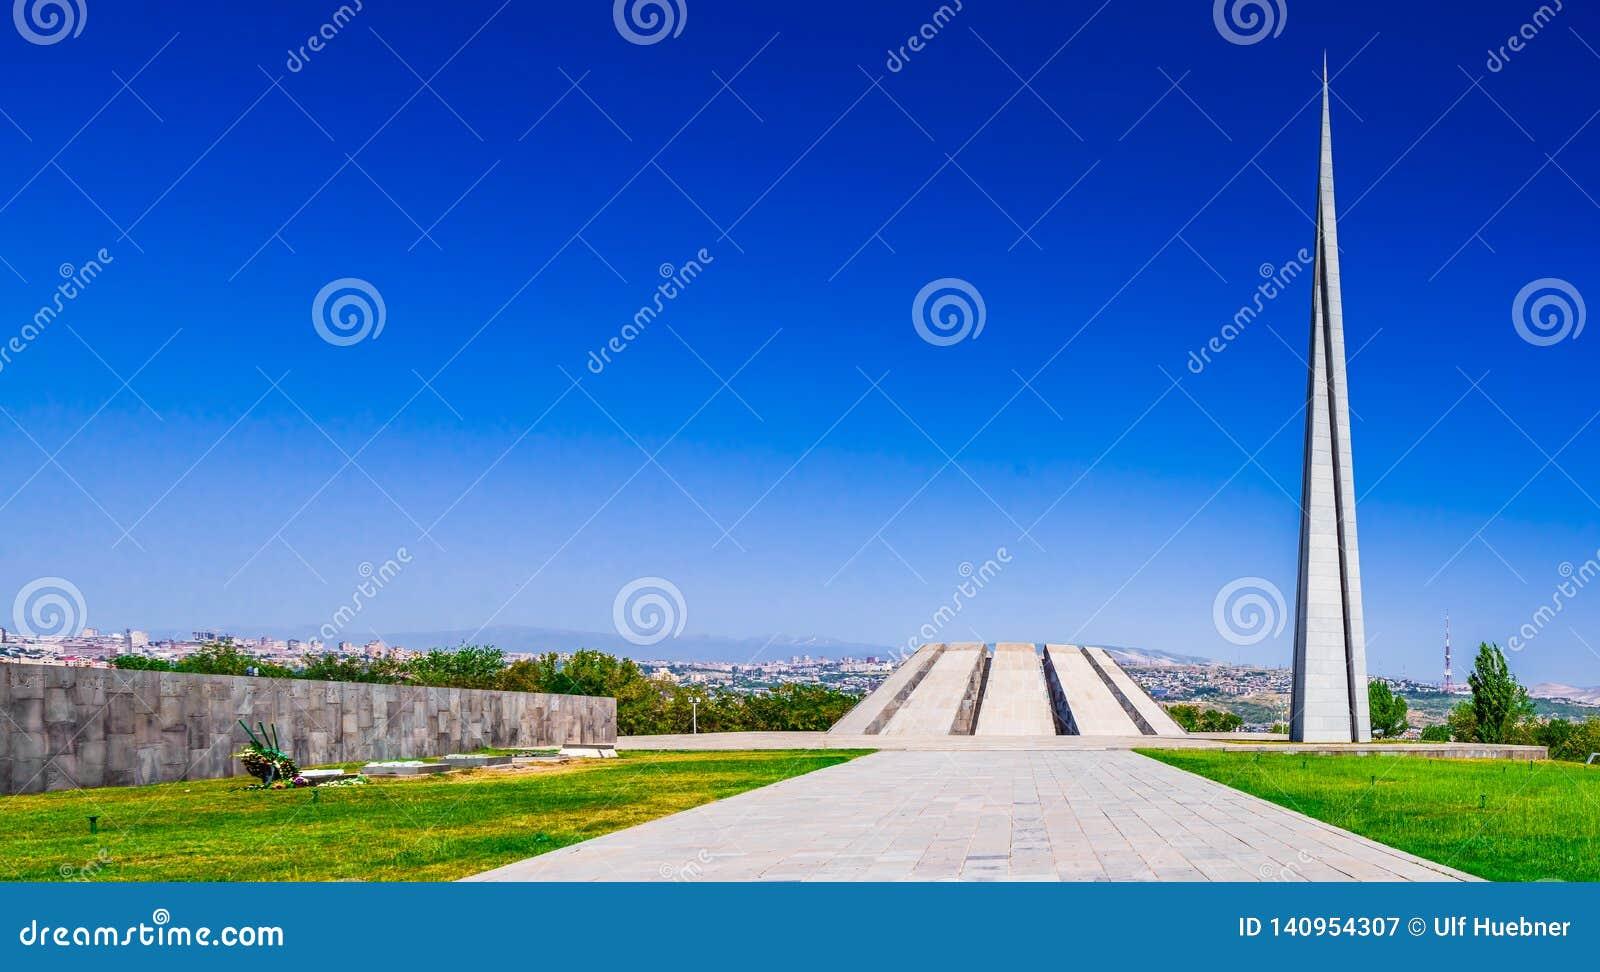 Weergeven op Armeense Volkerenmoord herdenkings complex in Yerevan, Armenië